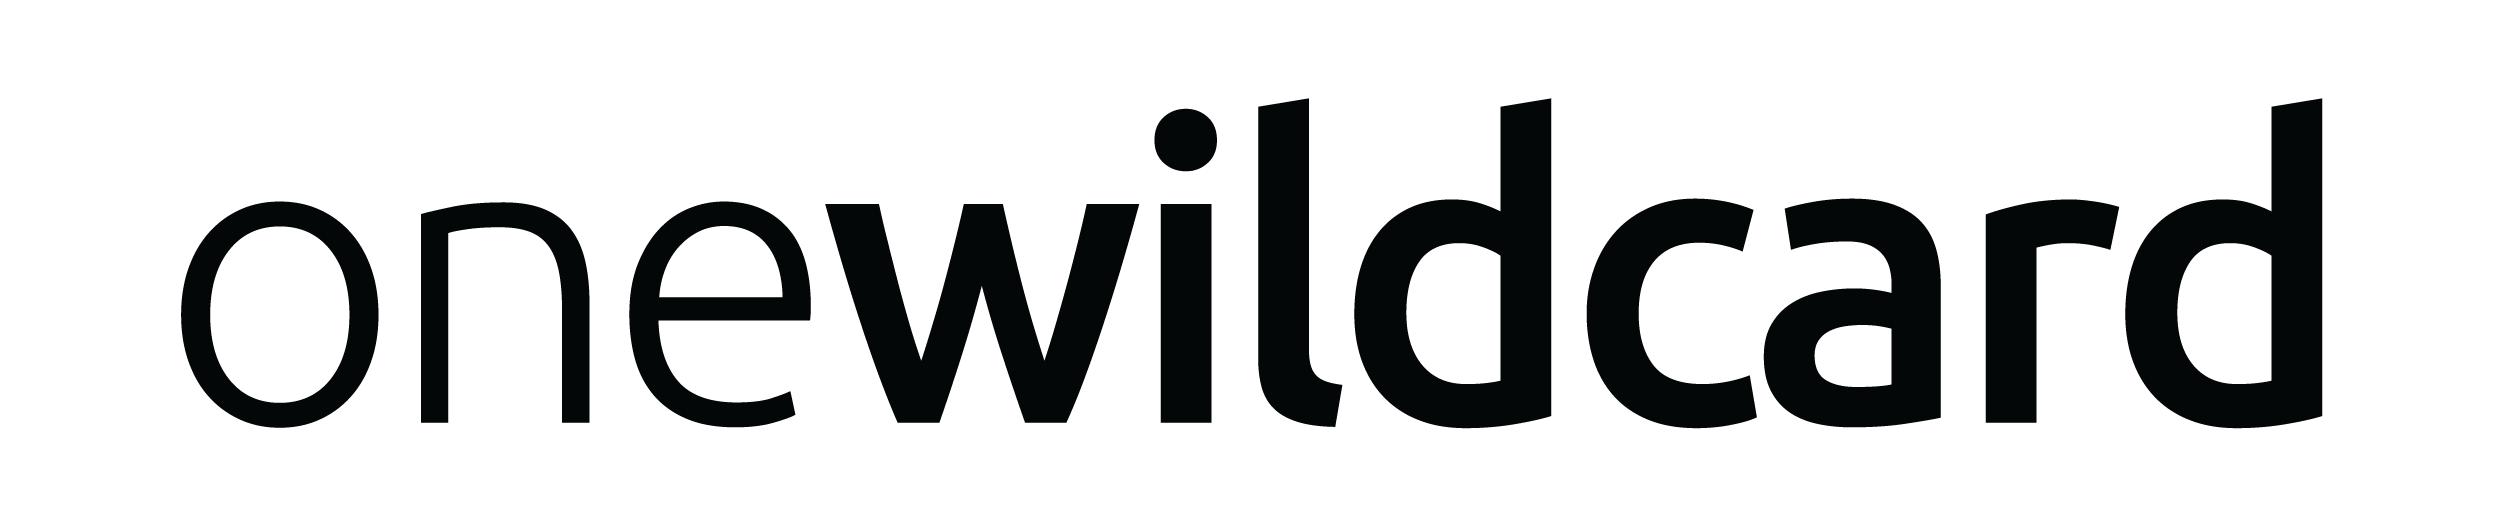 onewildcard logo-02-01